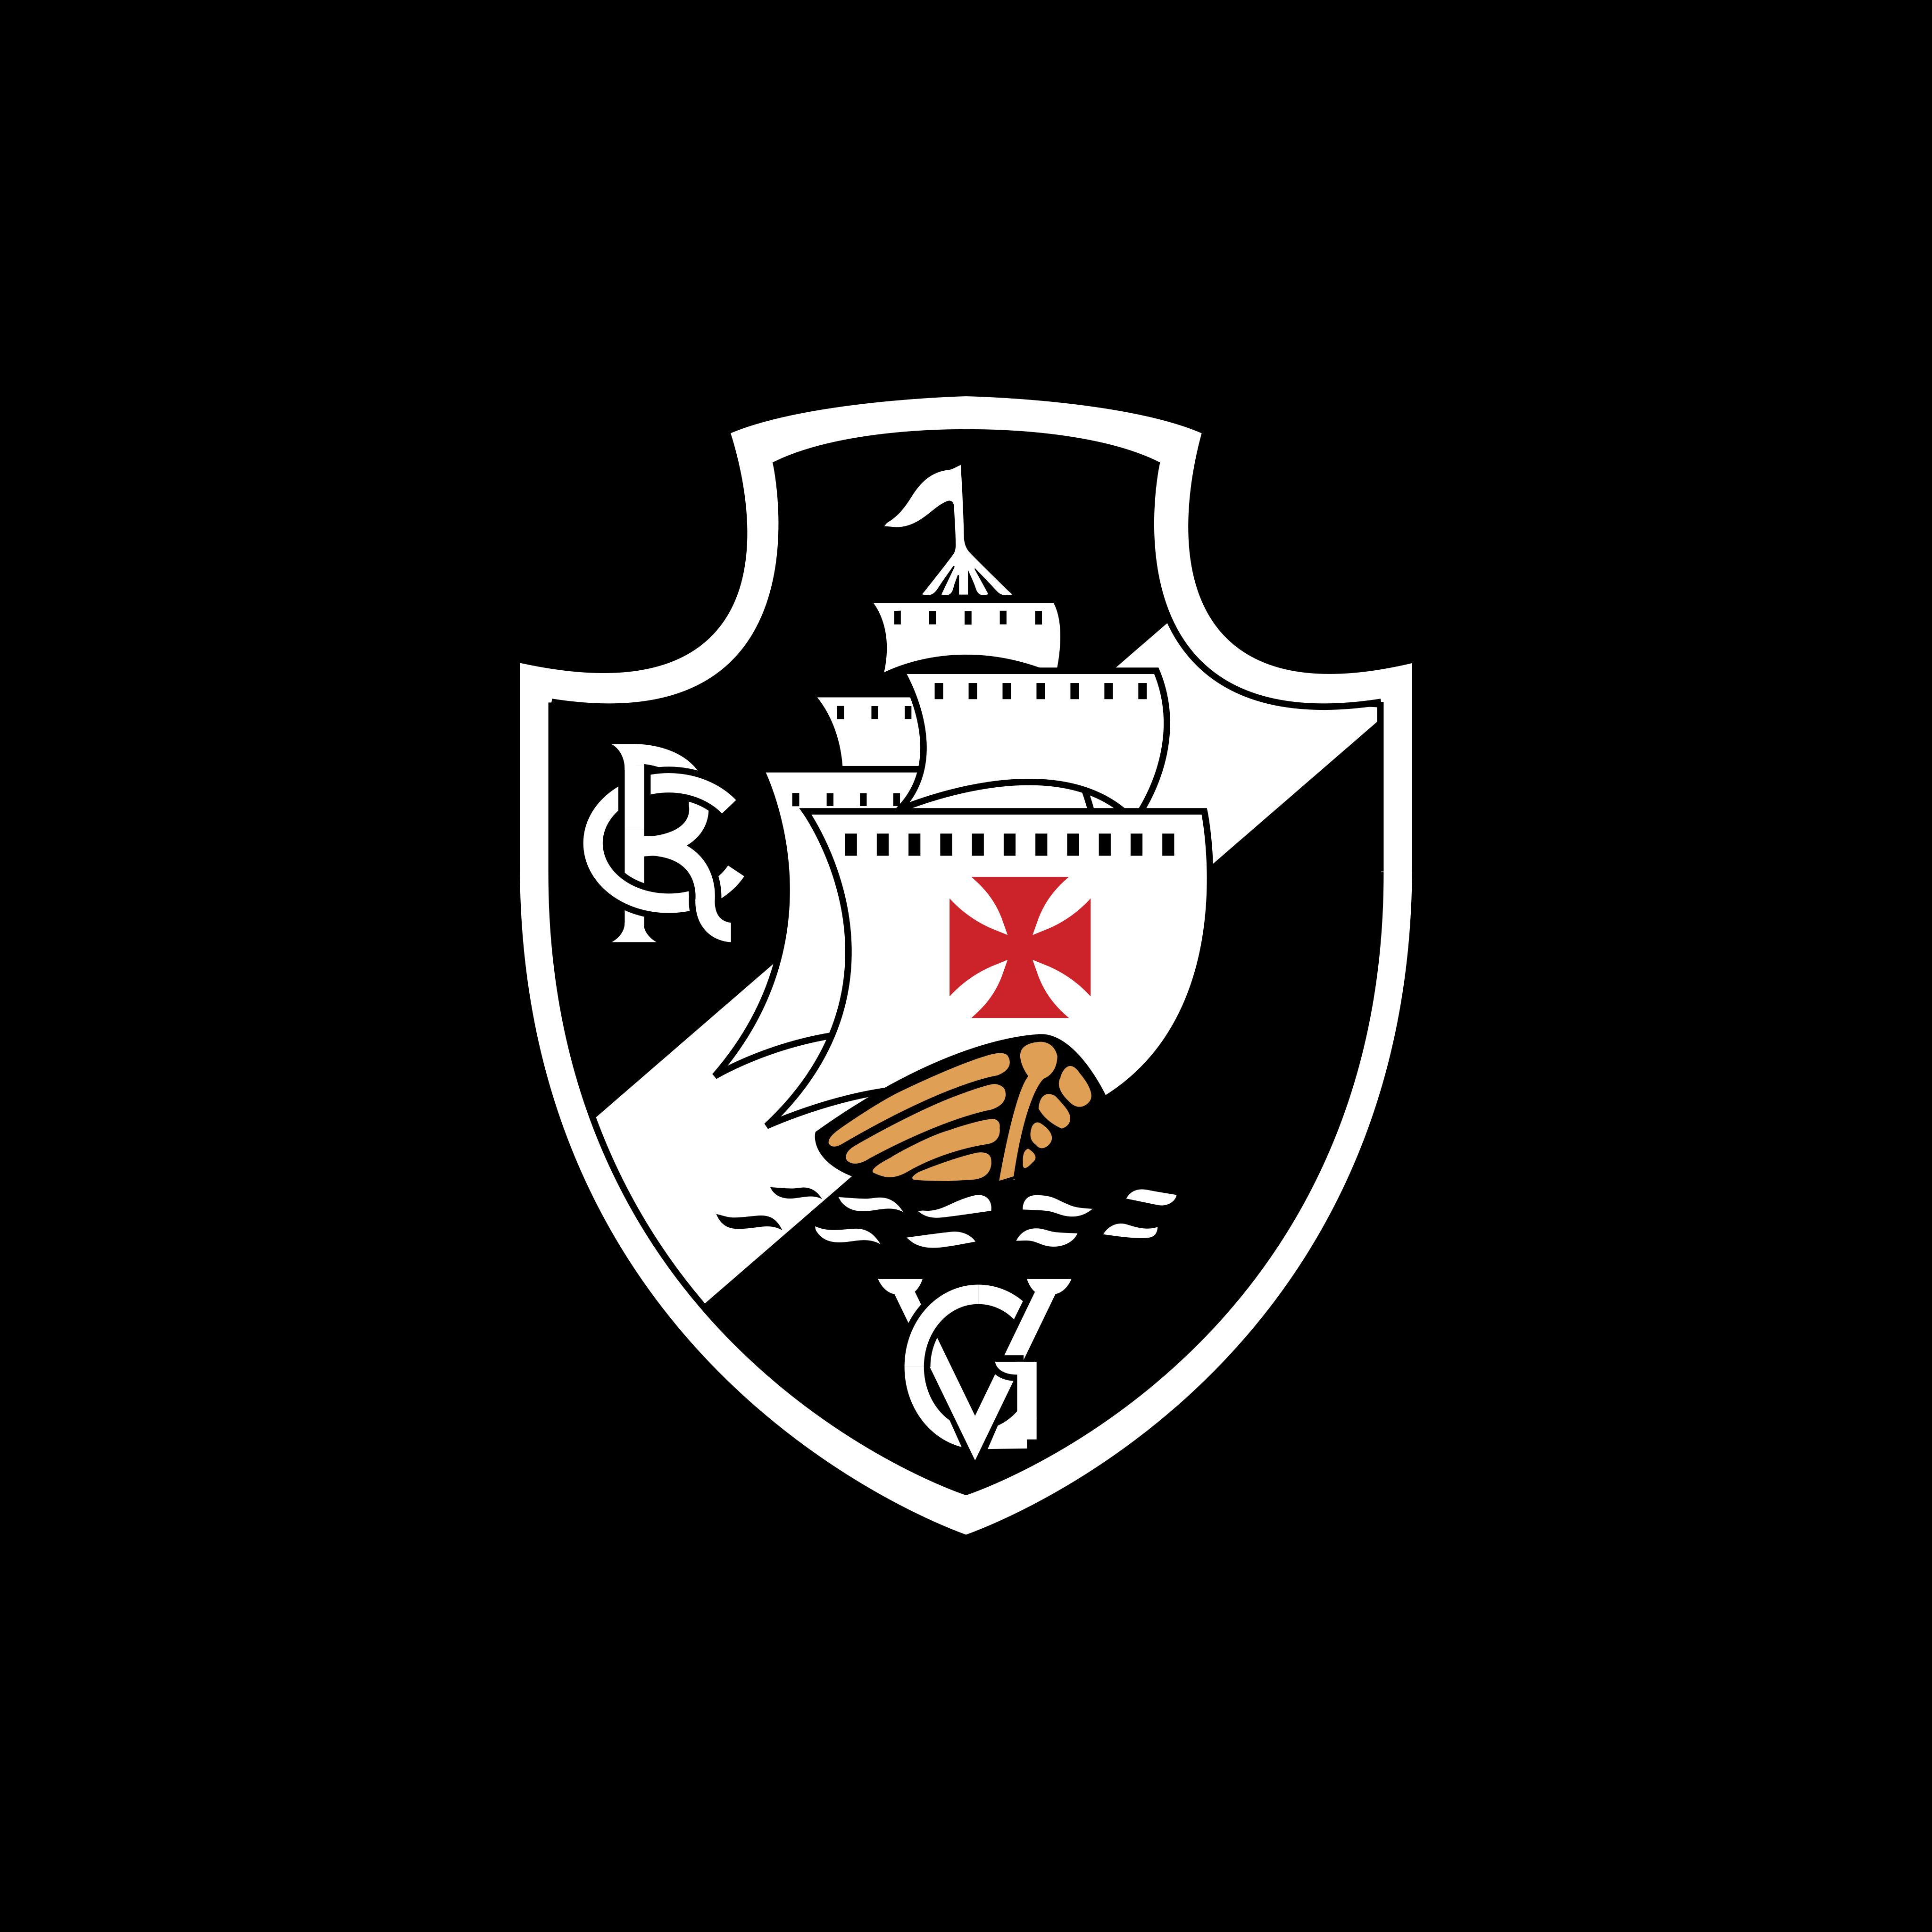 vasco da gama logo 0 - Vasco da Gama Logo